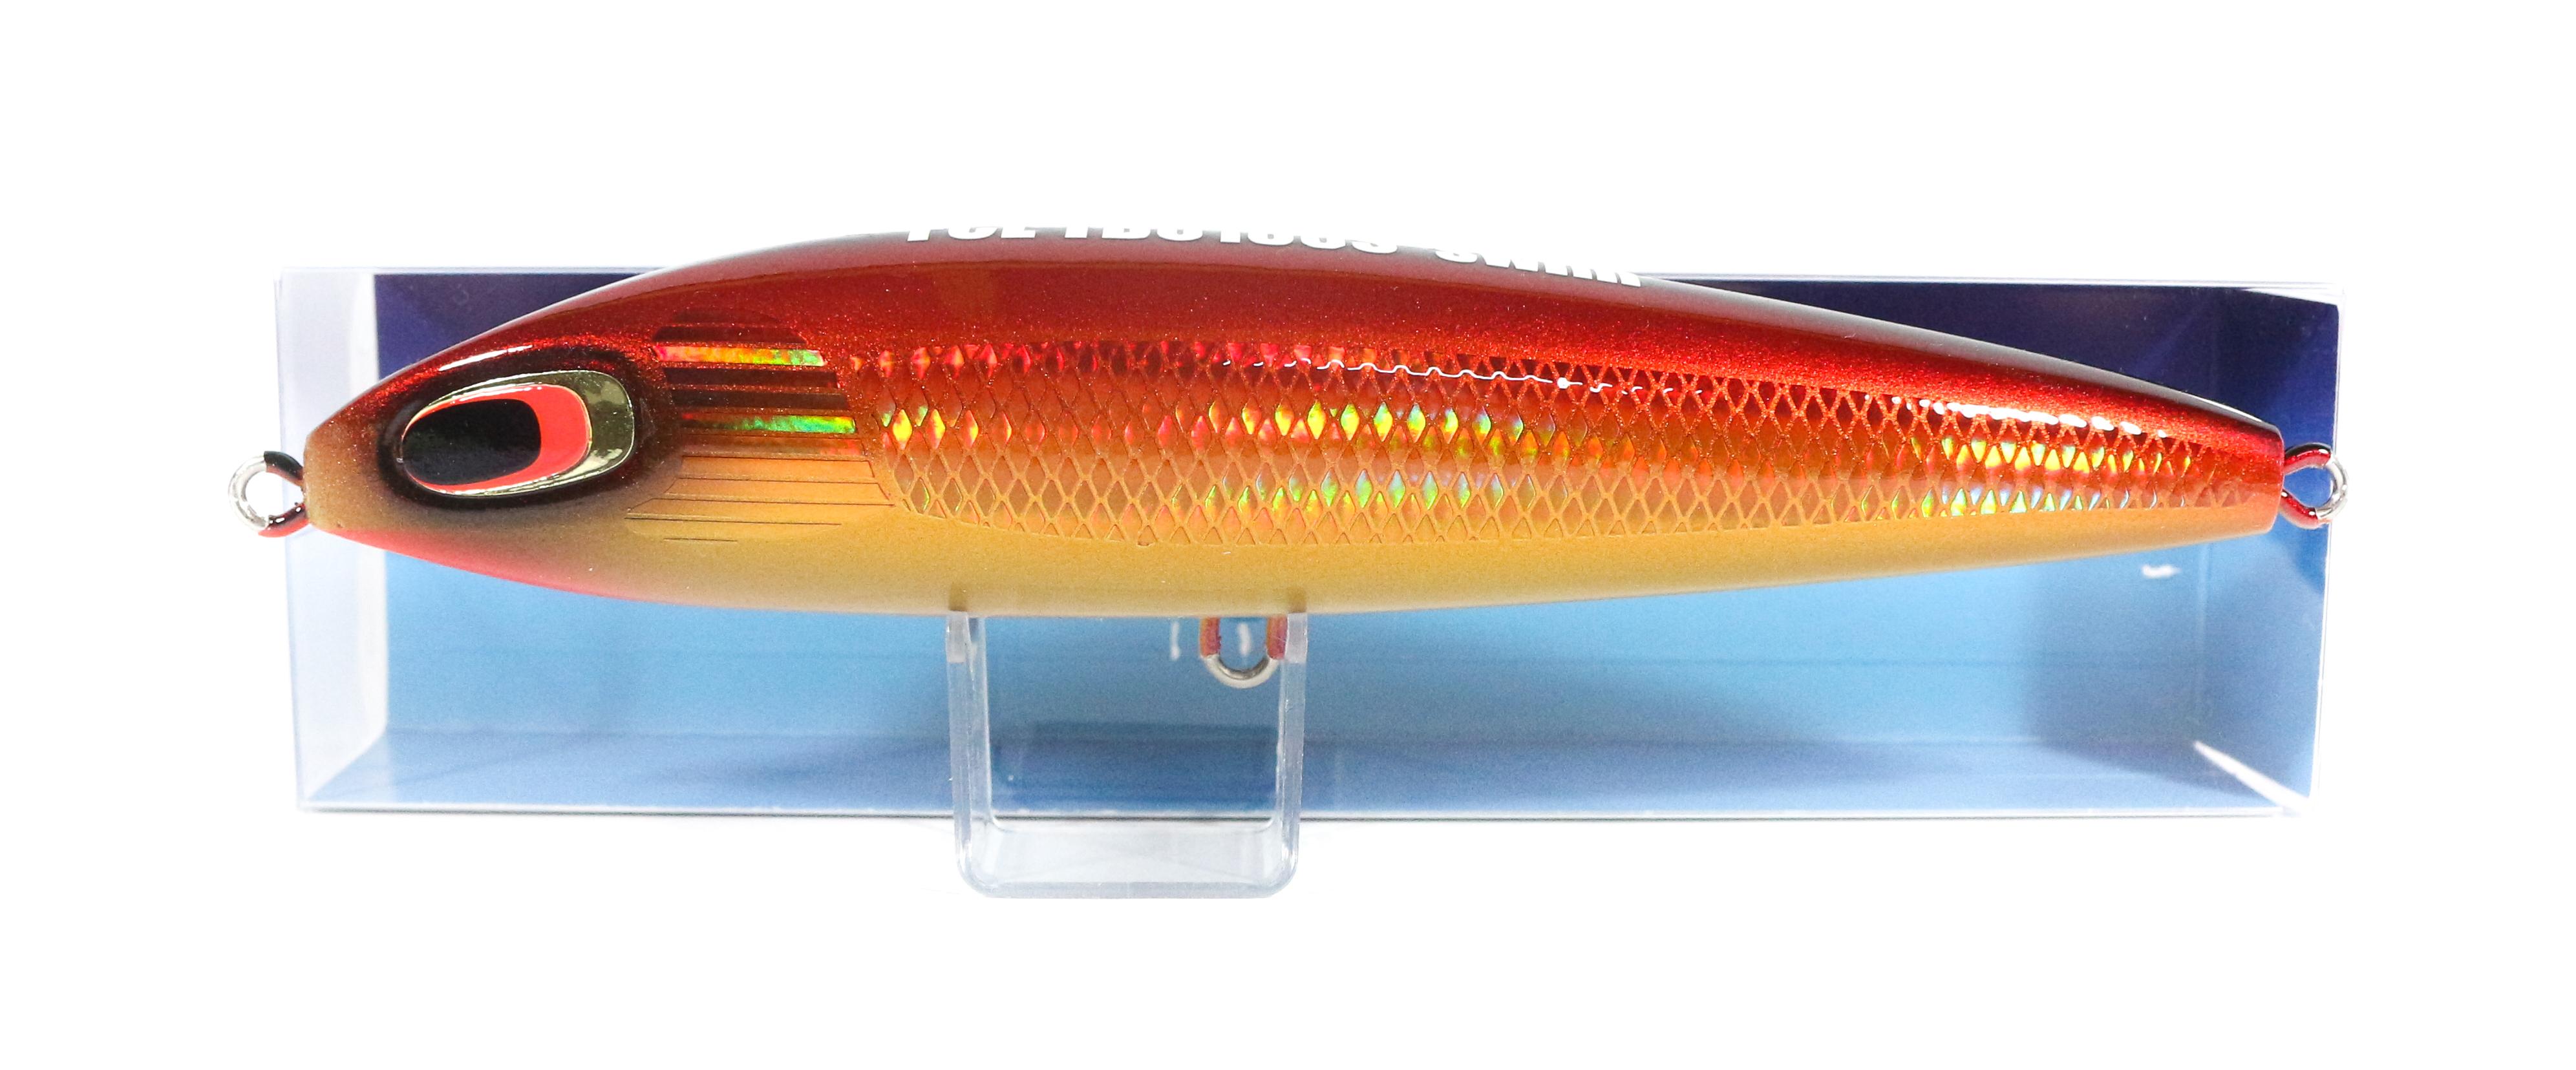 5227 FCL Labo Stick Bait TBO 180S Swim Sinking Lure 93 grams RGS